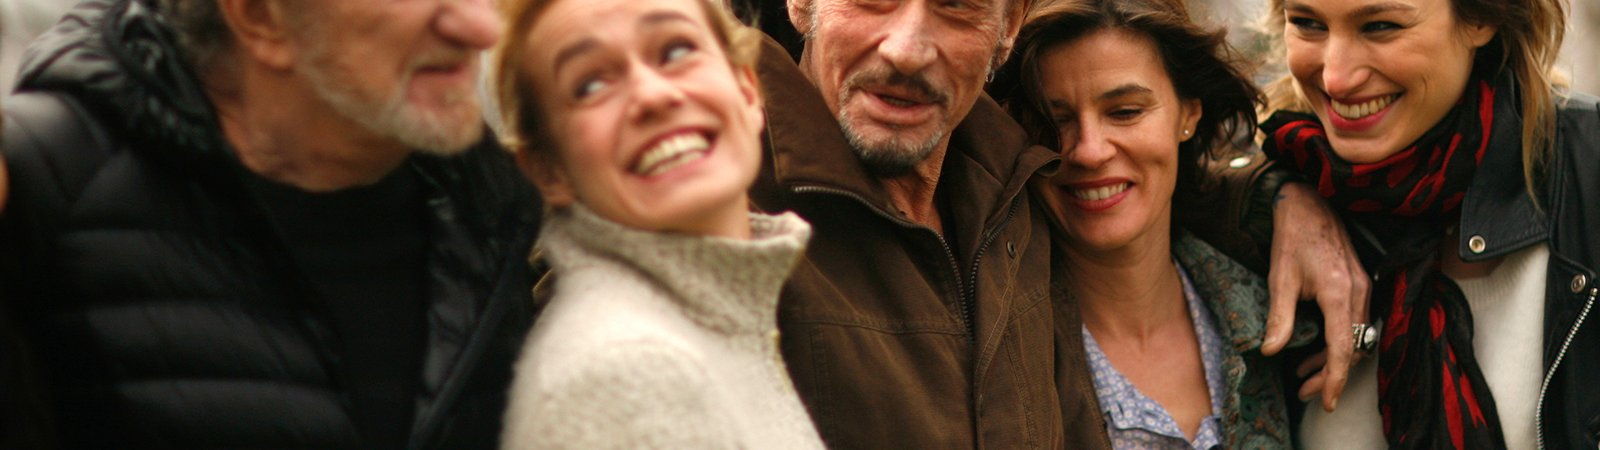 Photo dernier film Valérie Kaprisky